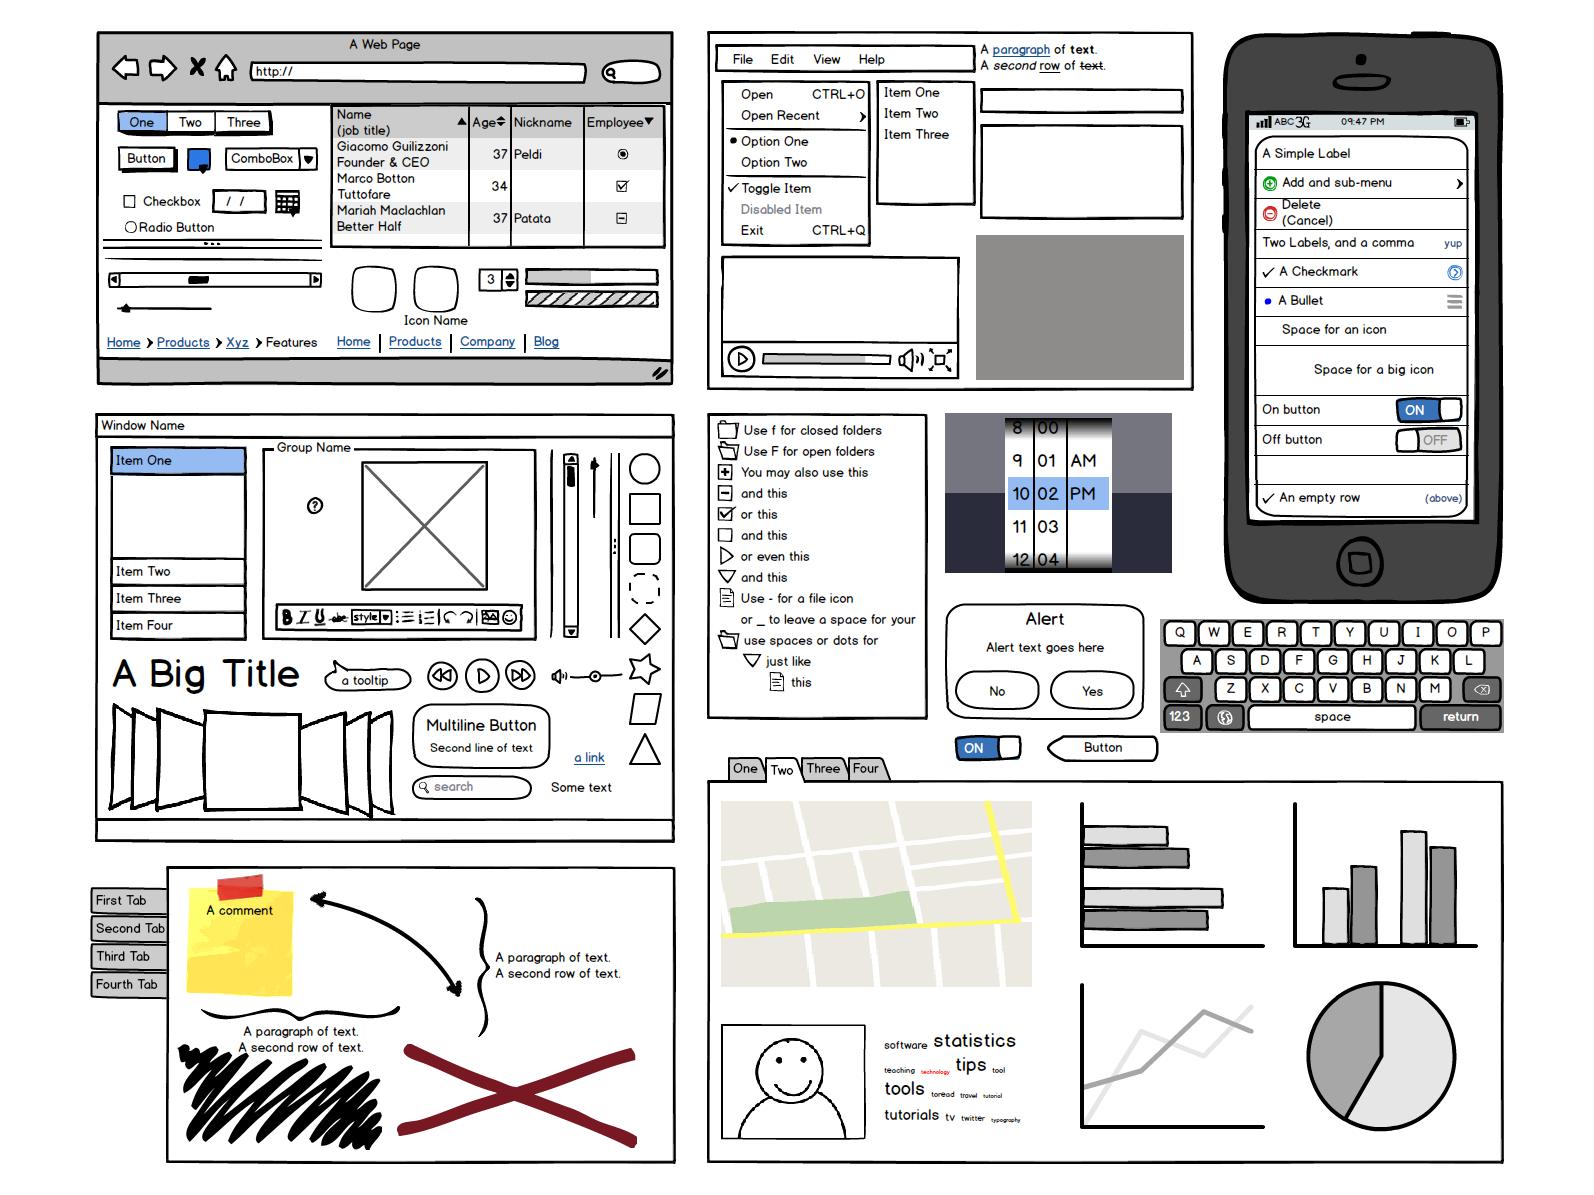 Balsamiq mockups website scribble tool programming pinterest balsamiq mockups website scribble tool ccuart Choice Image